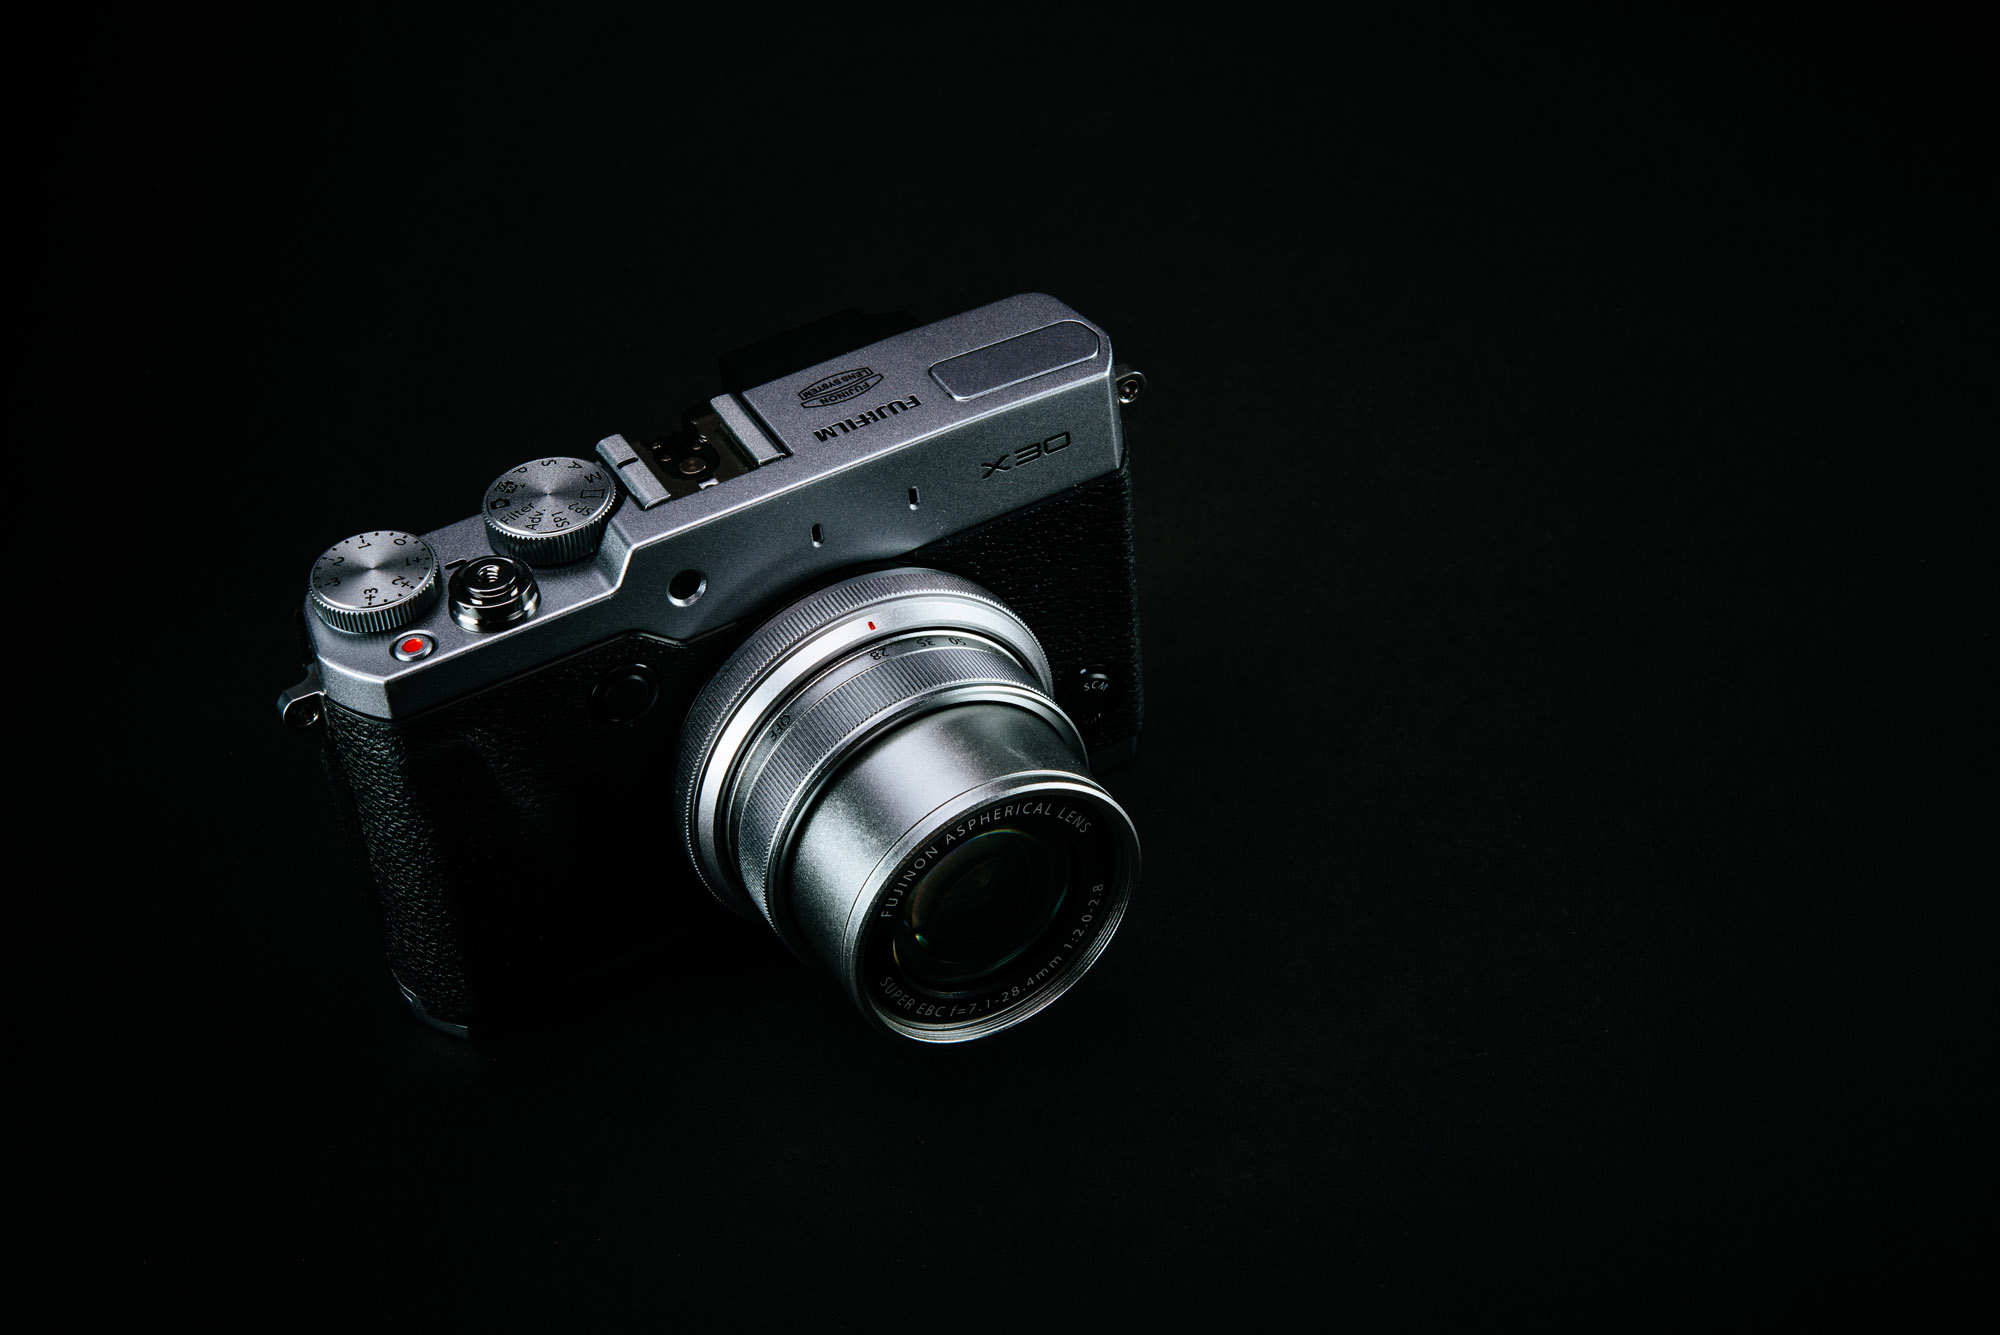 fujifilm-x30-review-01